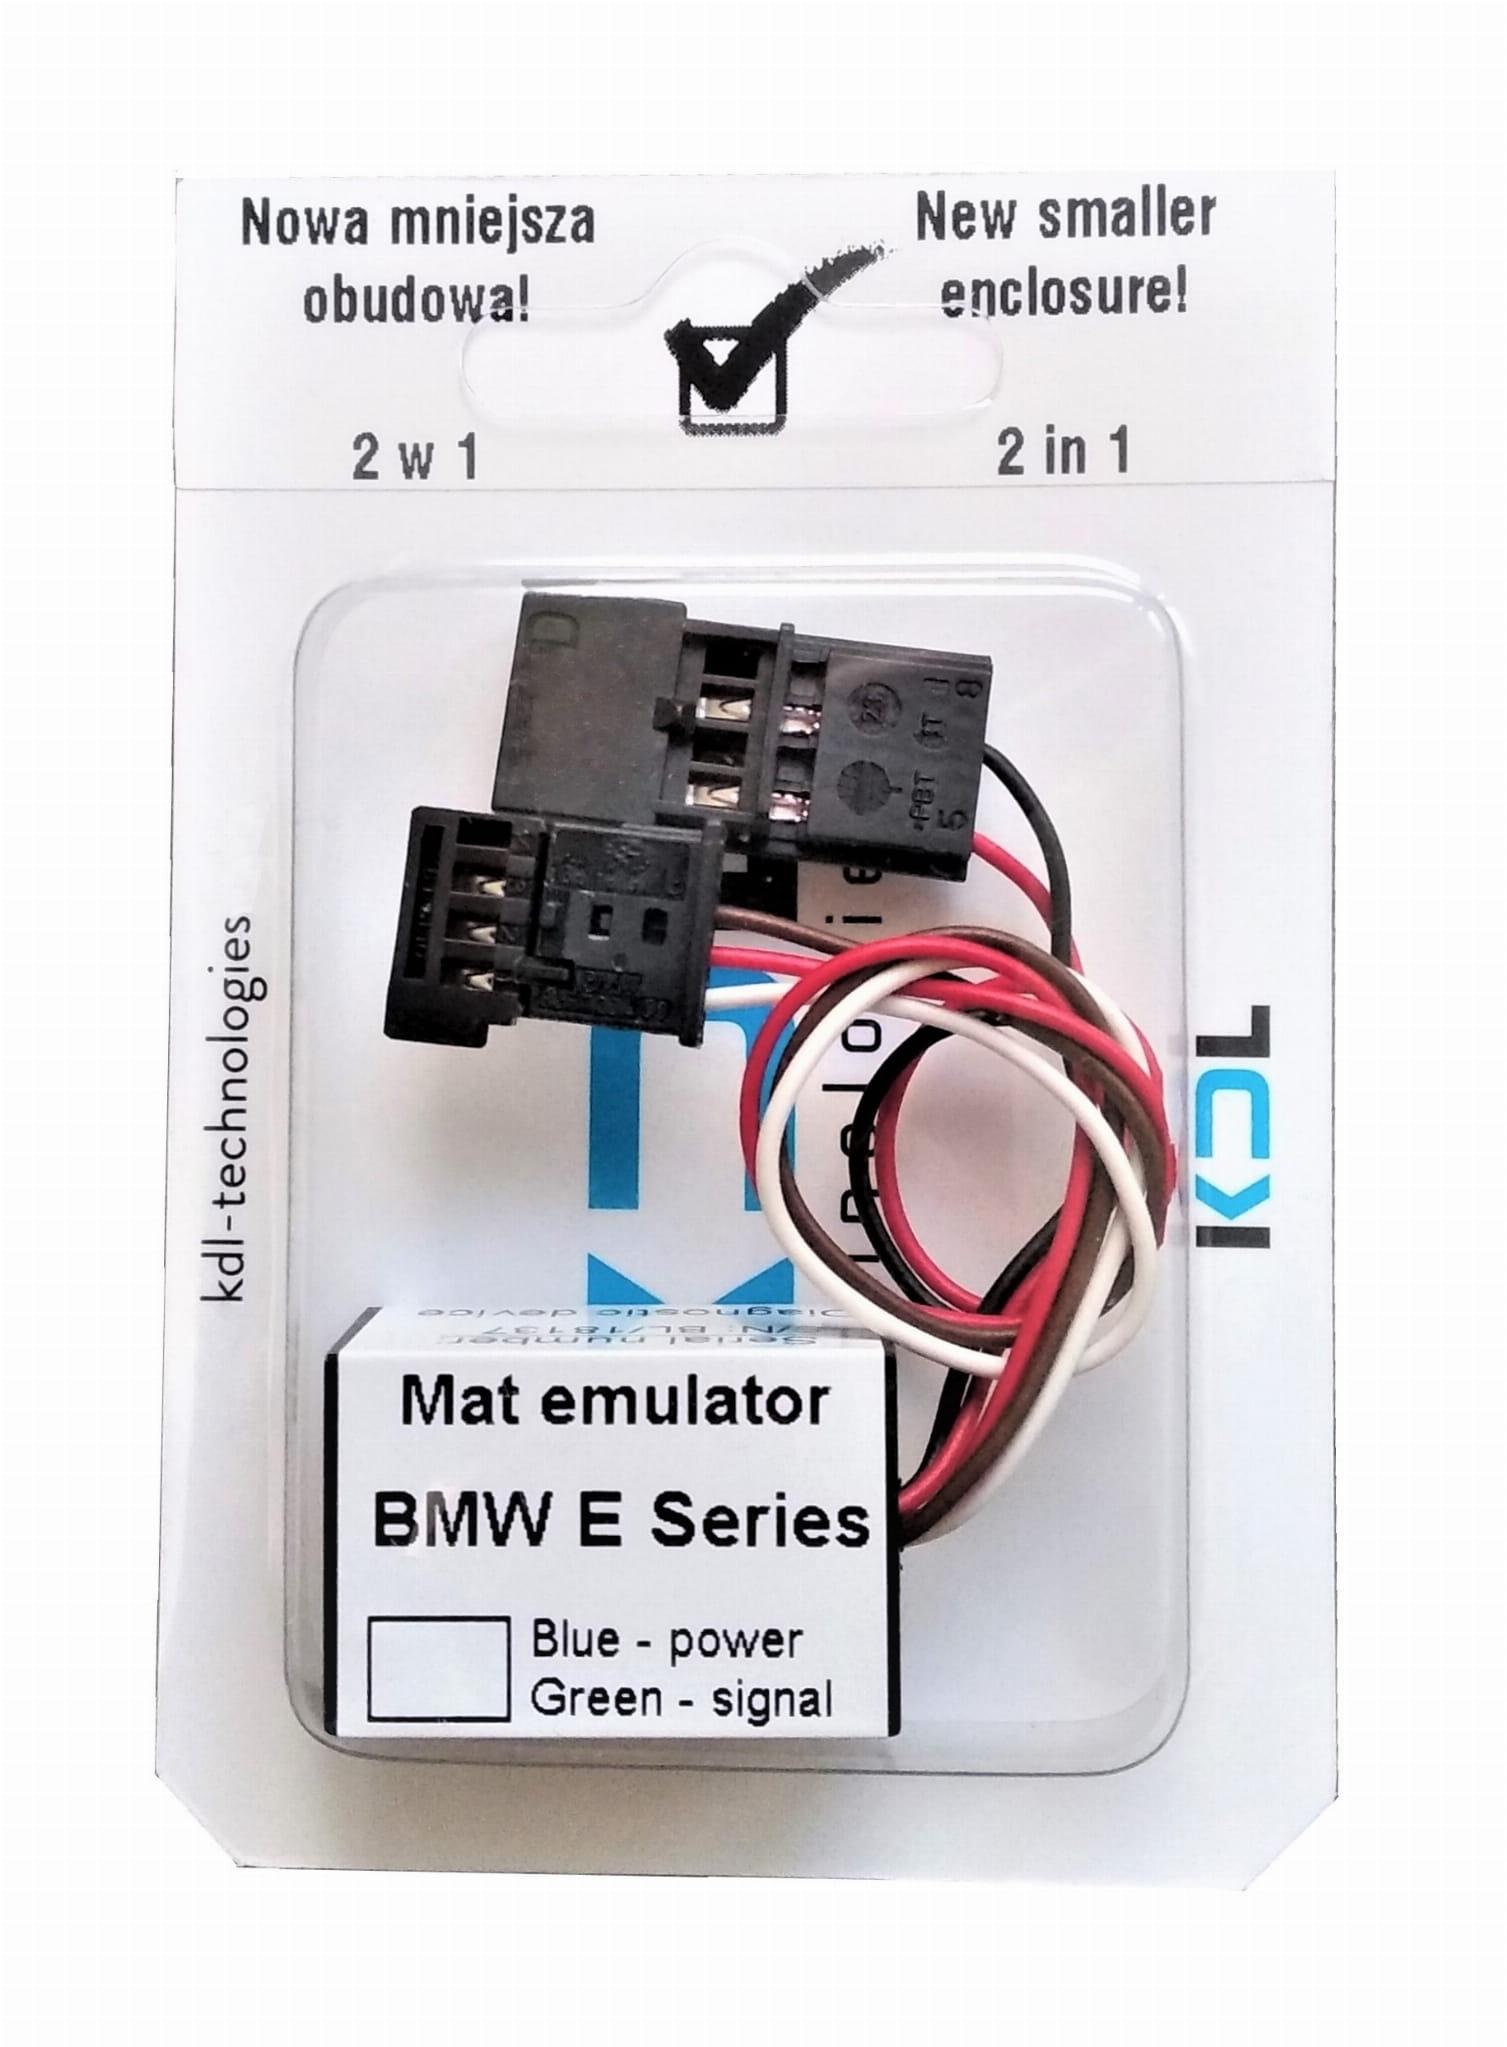 BMW E60 E61 seat occupancy sensor emulator with a seat belt simulator - US/  EU